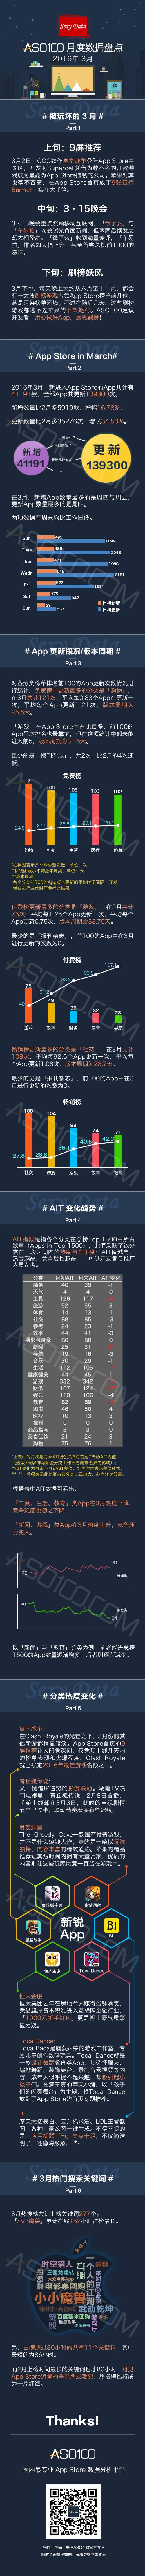 App Store数据报告,热搜词,饿了么